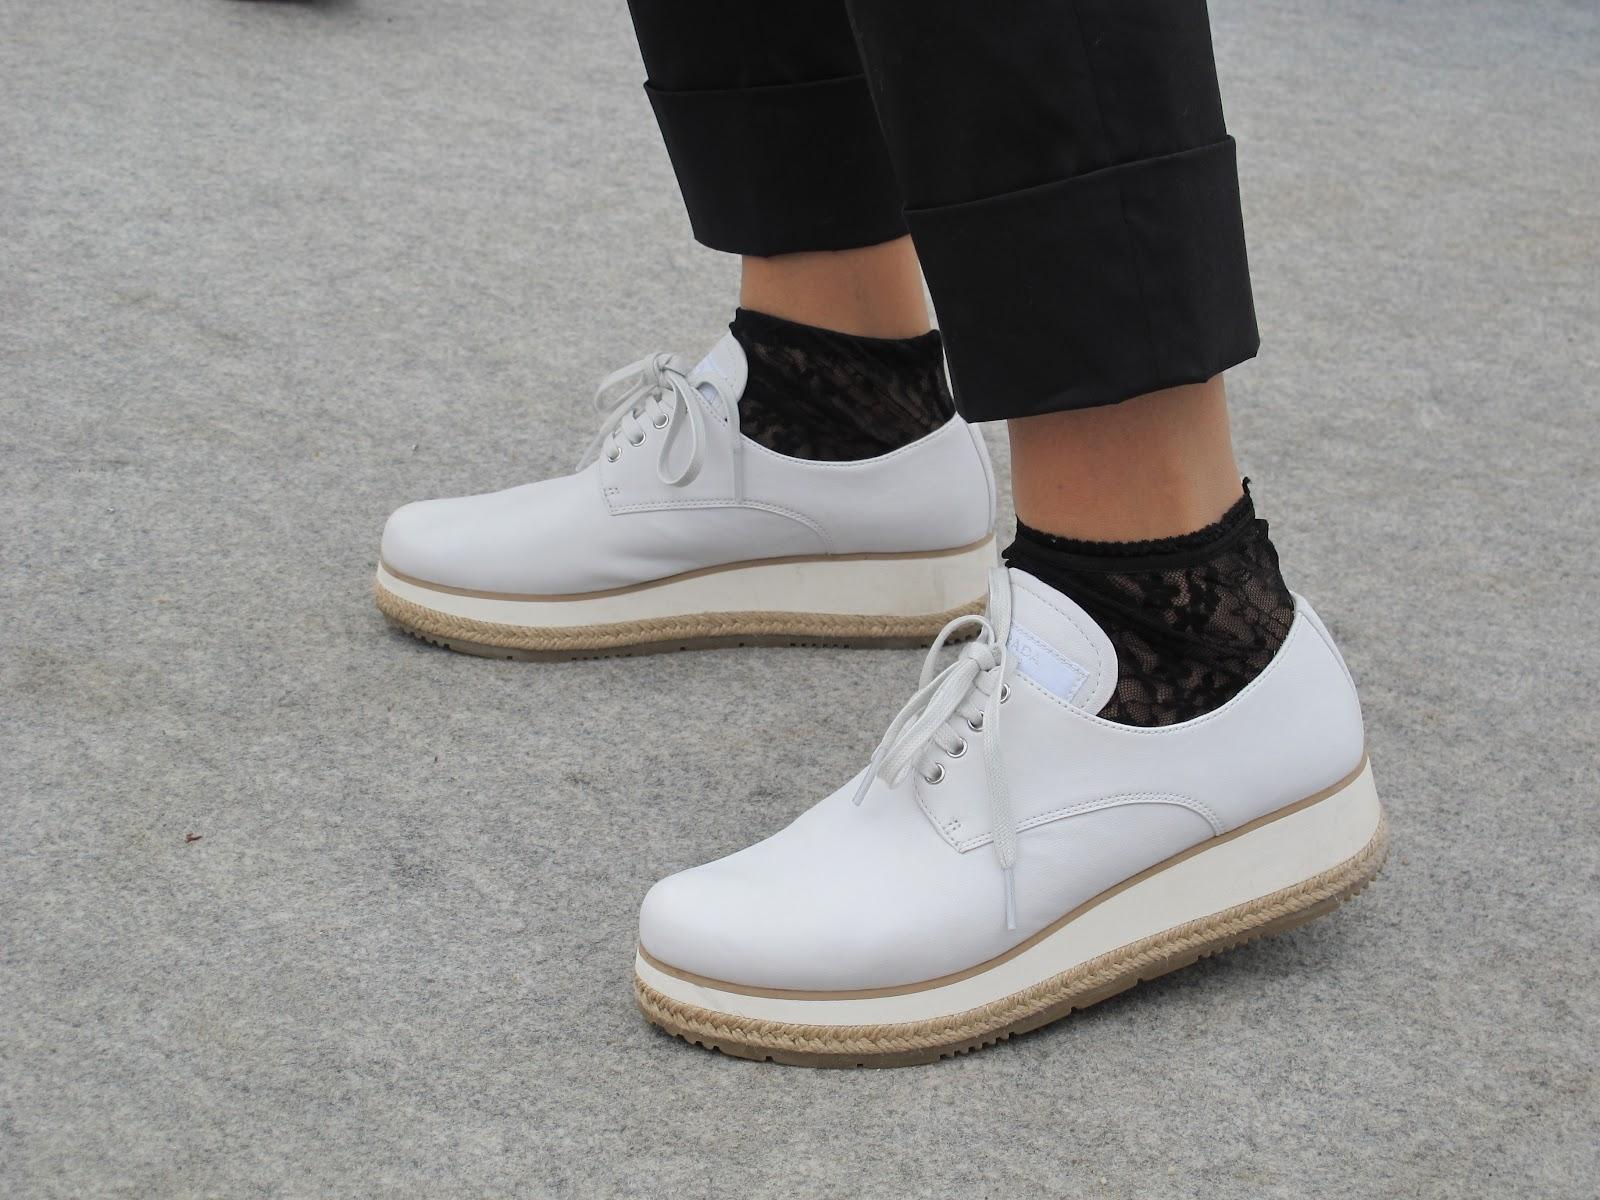 033a7feb75edcb The chaussures: Derby blanche , semelle en corde